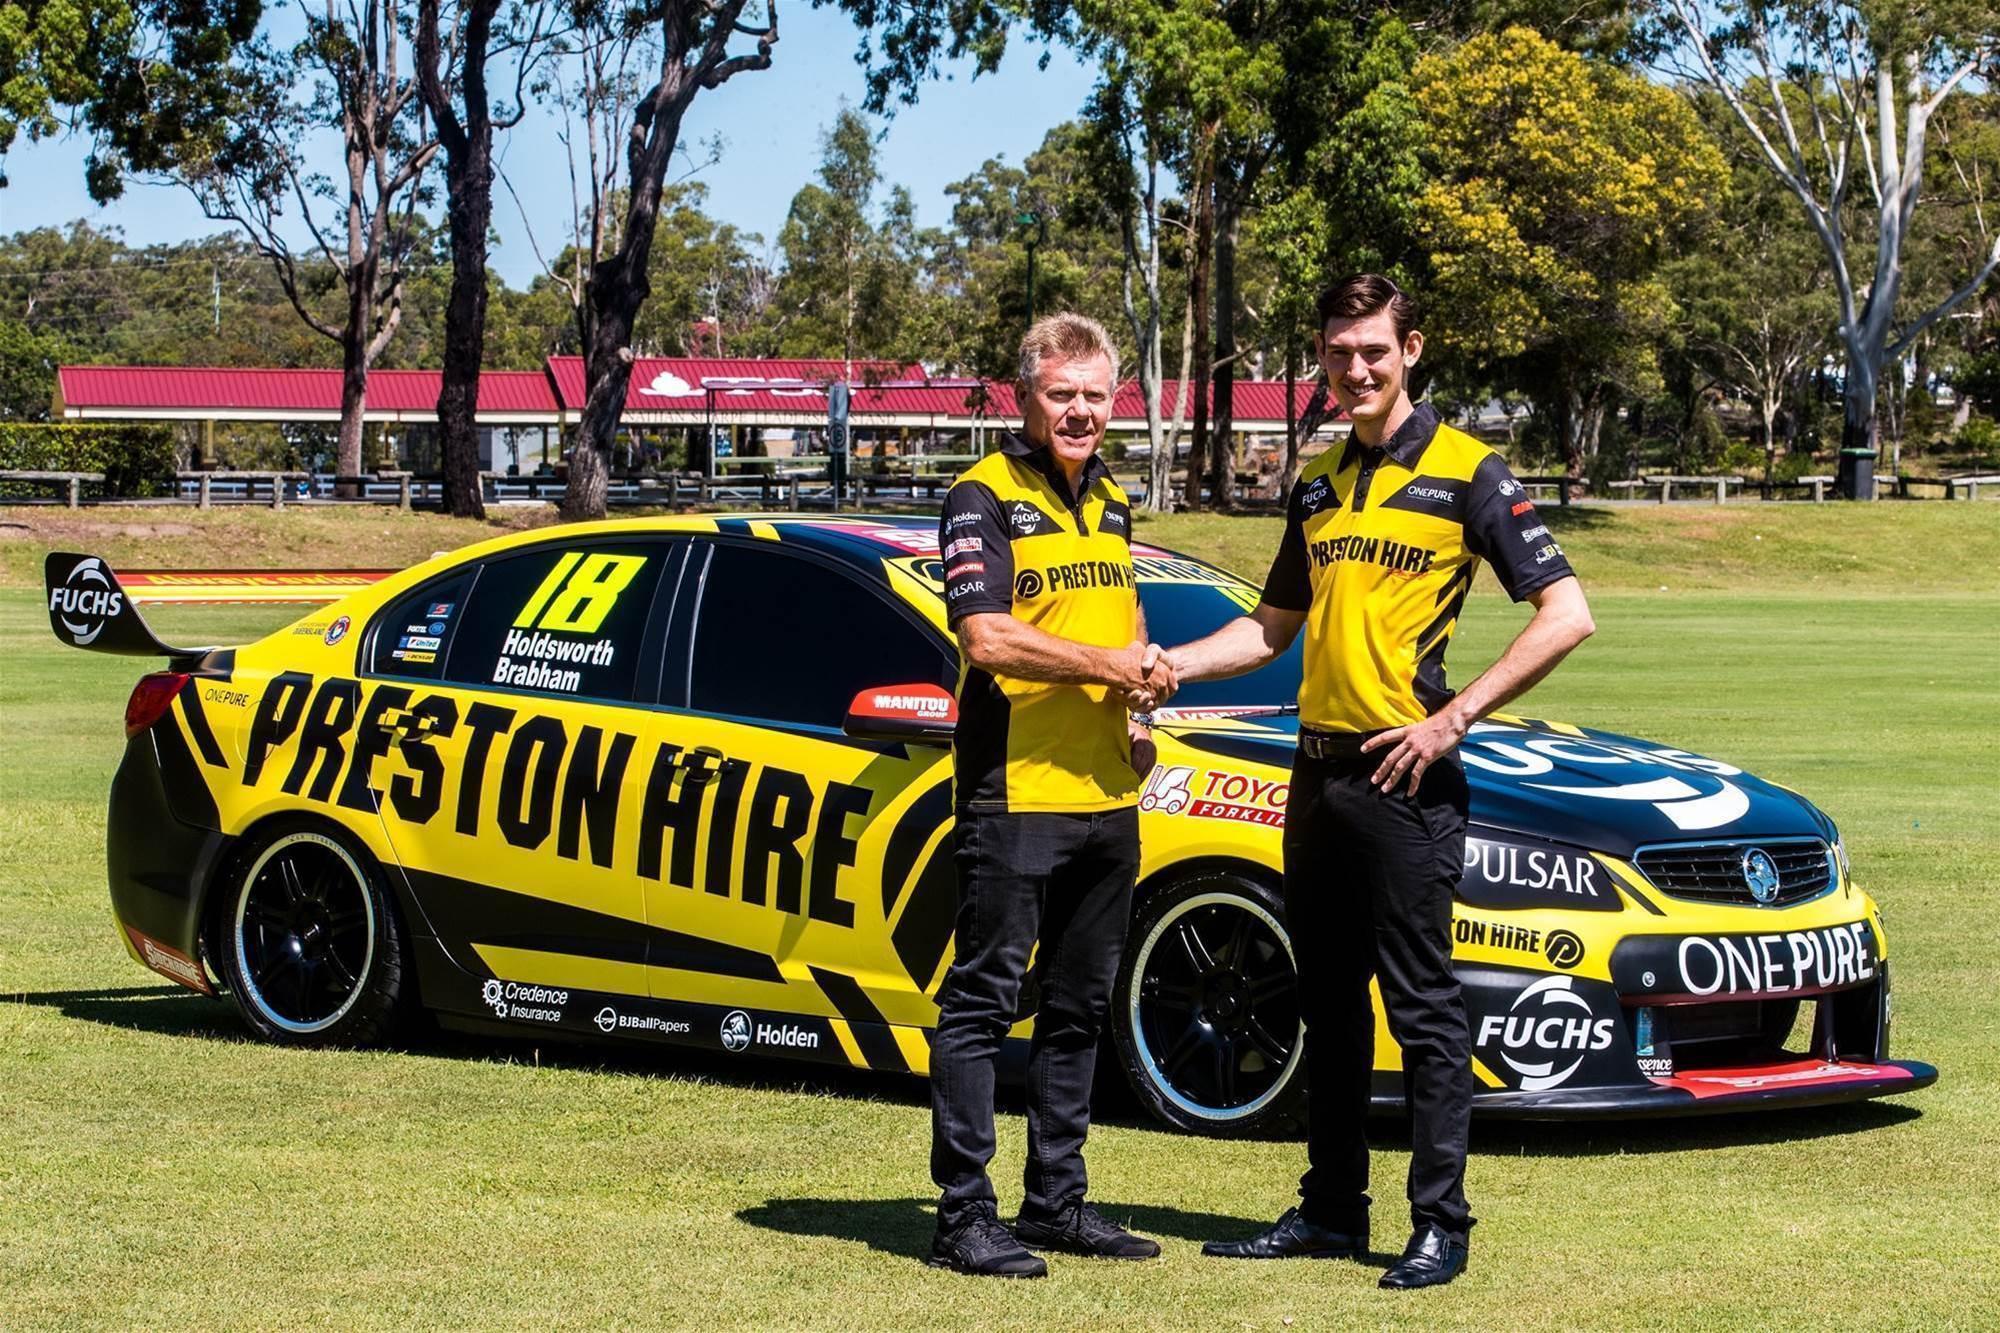 Pic gallery: Matt Brabham joins Preston Hire Racing